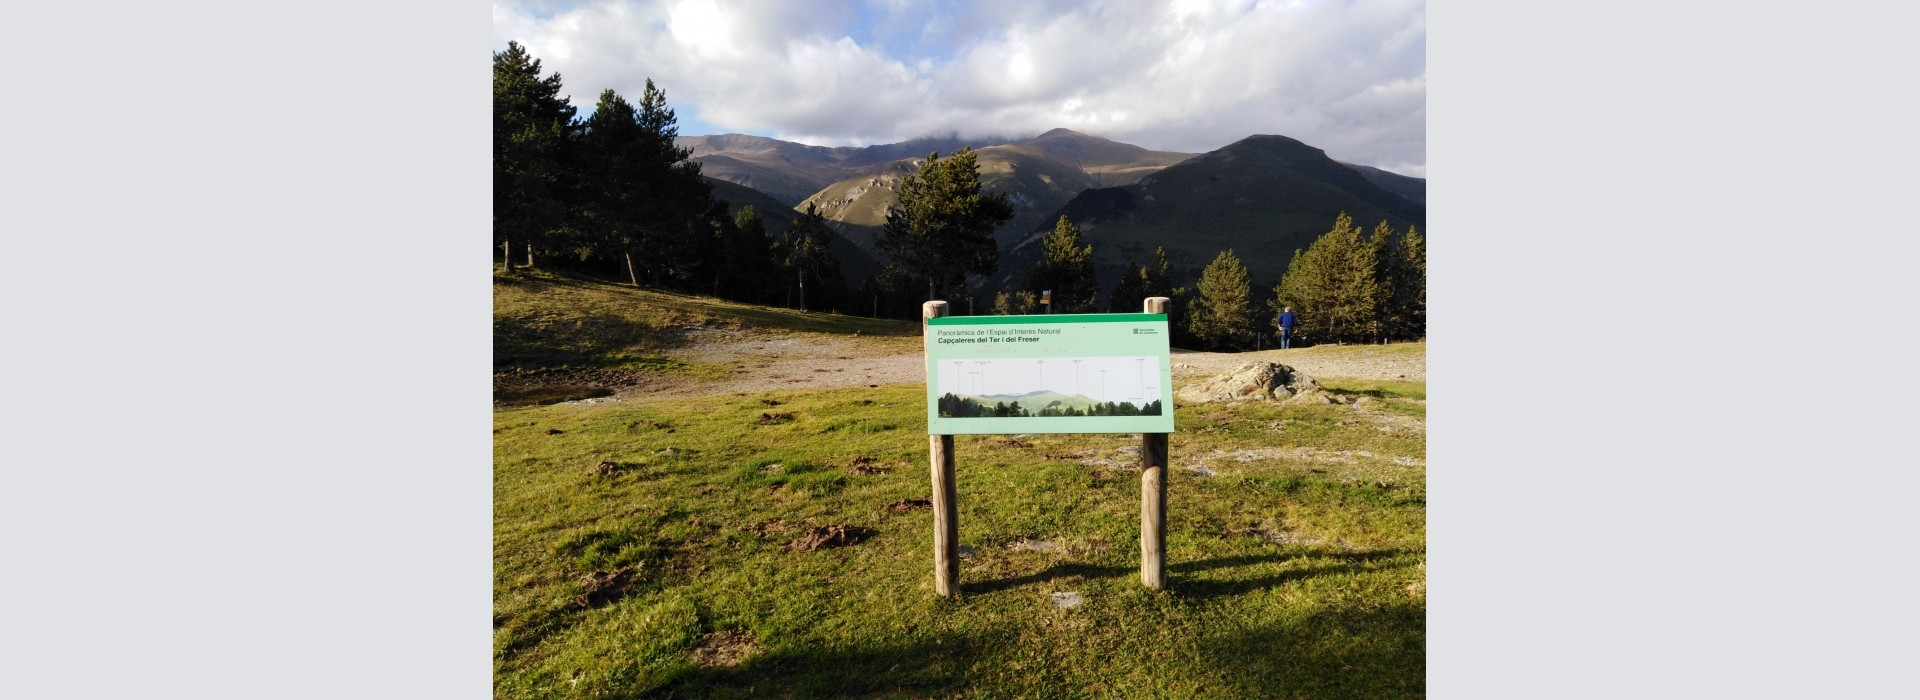 "Salida del GMC a la mina ""Zaragoza"" (Queralbs) y a las escombreras de las minas del collet de les Barraques (Planoles), en la Vall de Ribes, el Ripollès, Girona."